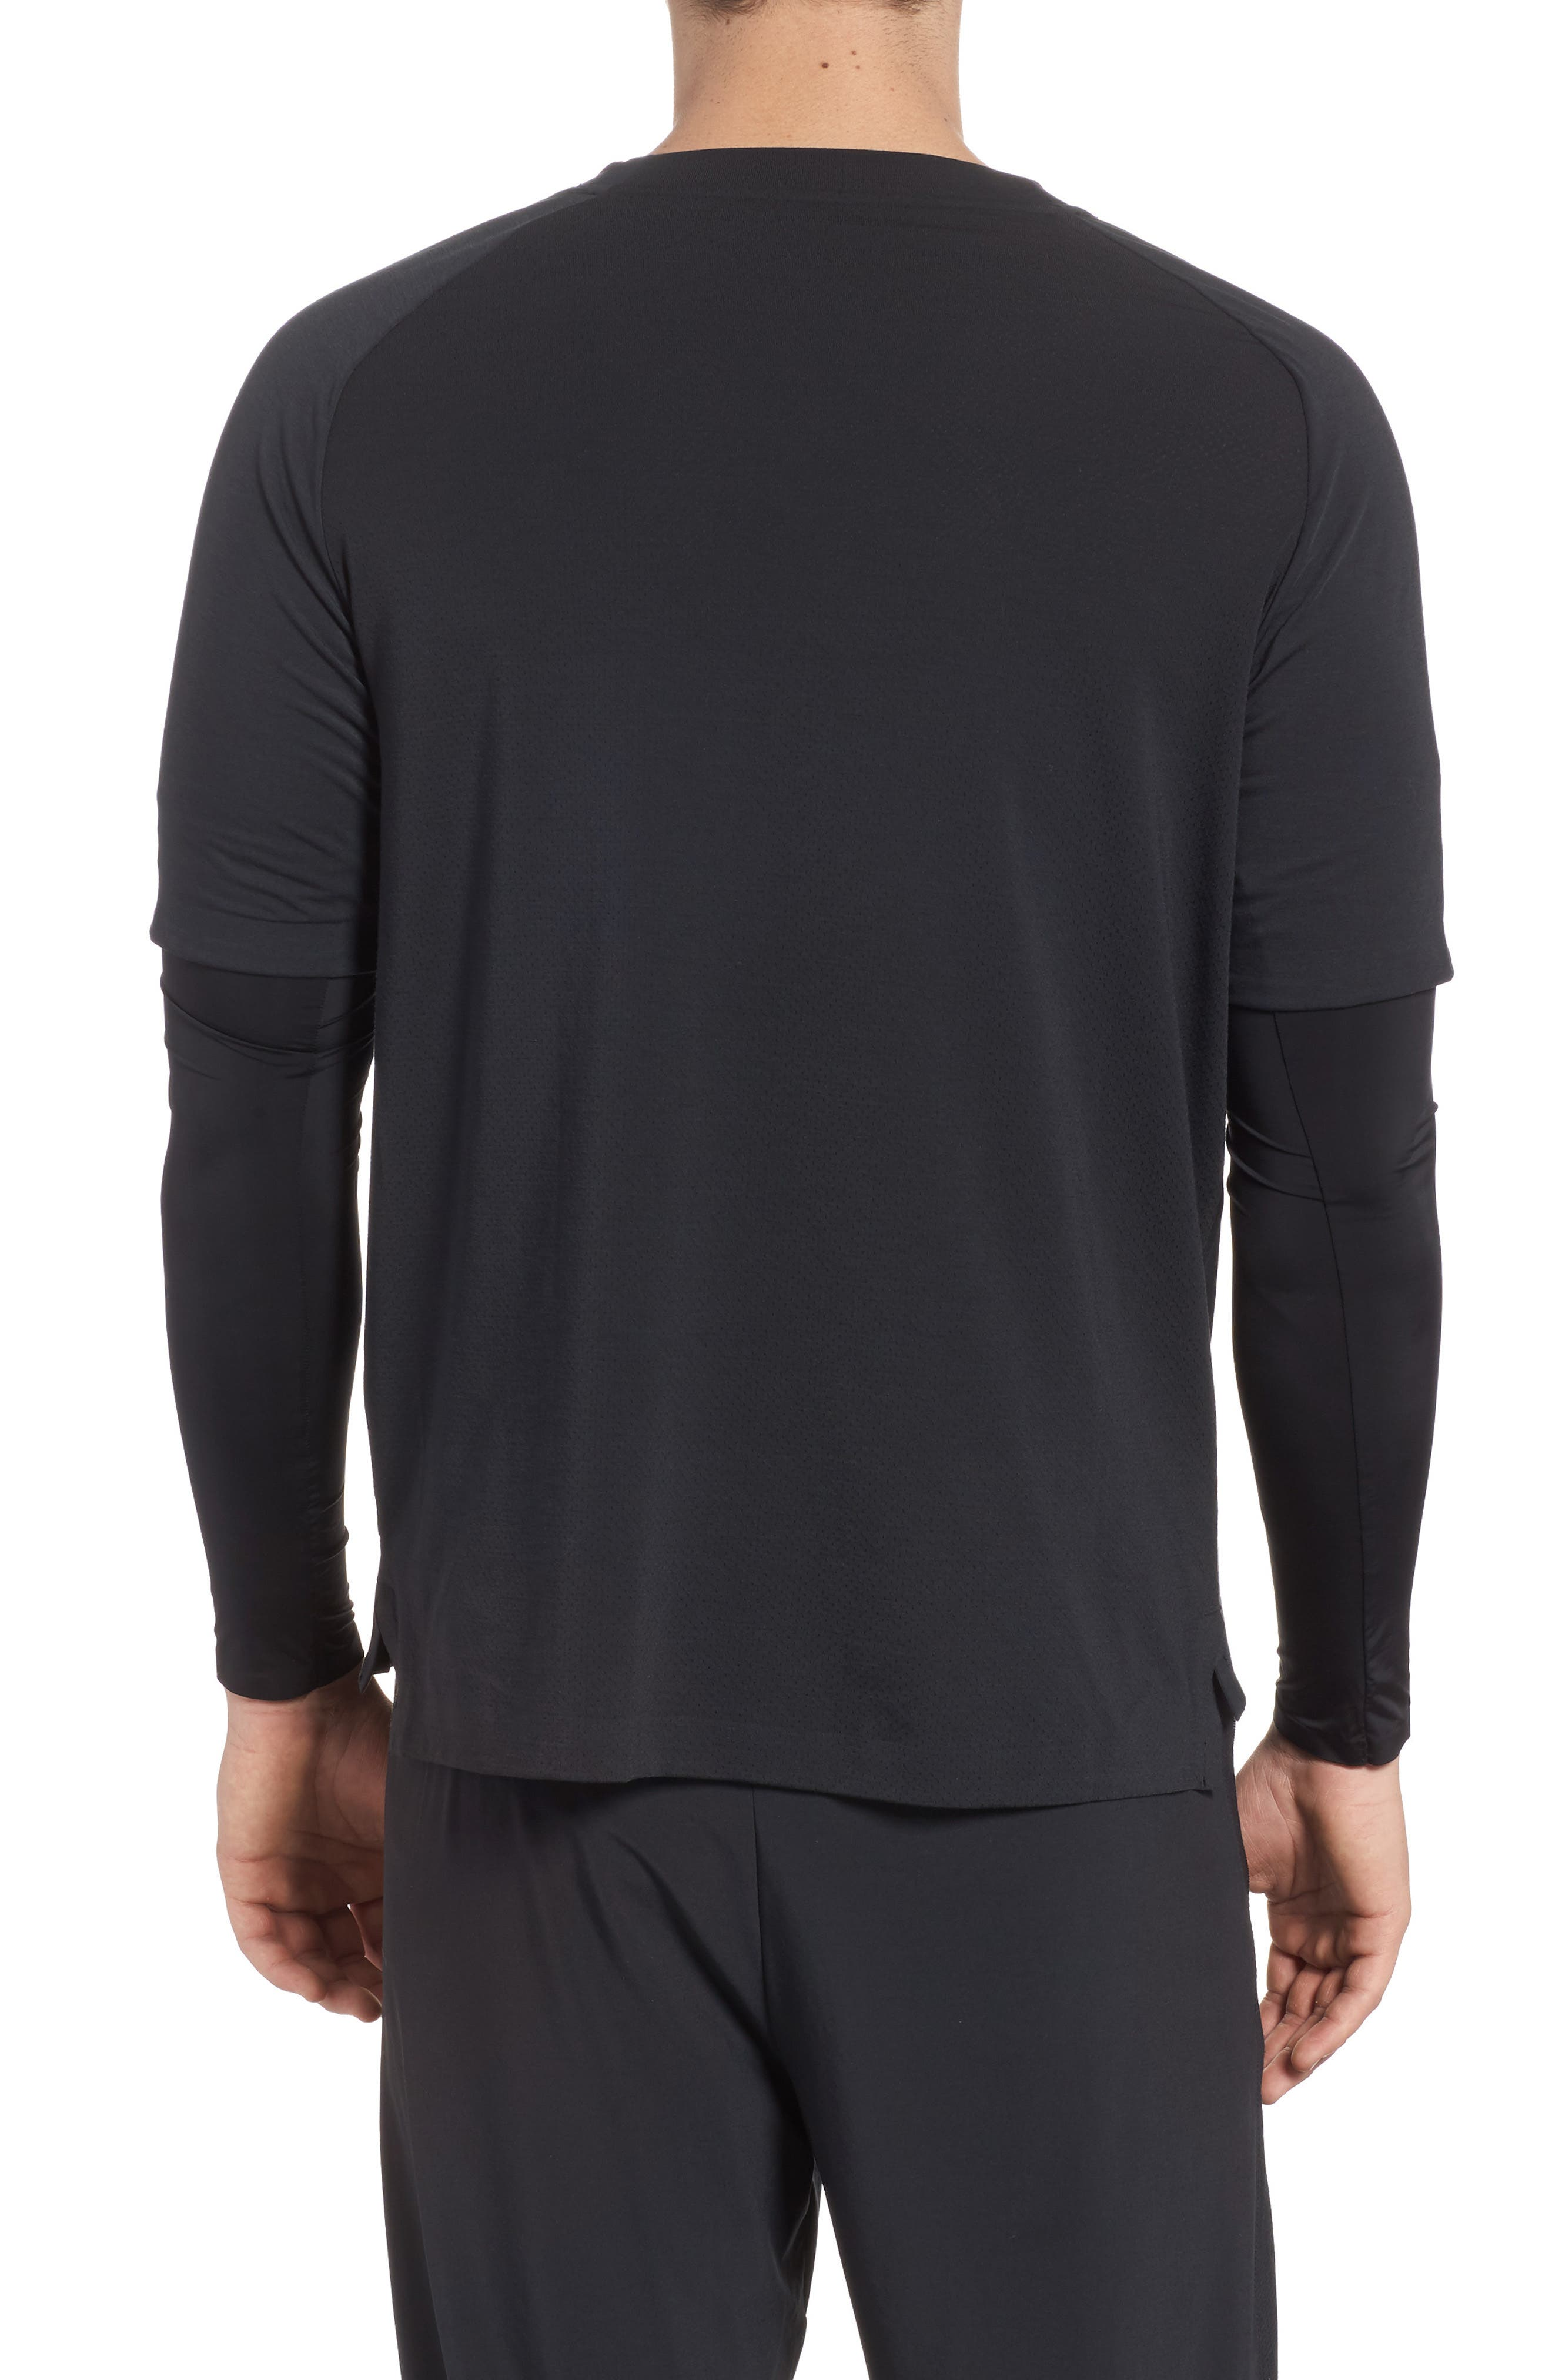 Alternate Image 2  - Nike Run Division Dry Layered Long Sleeve T-Shirt